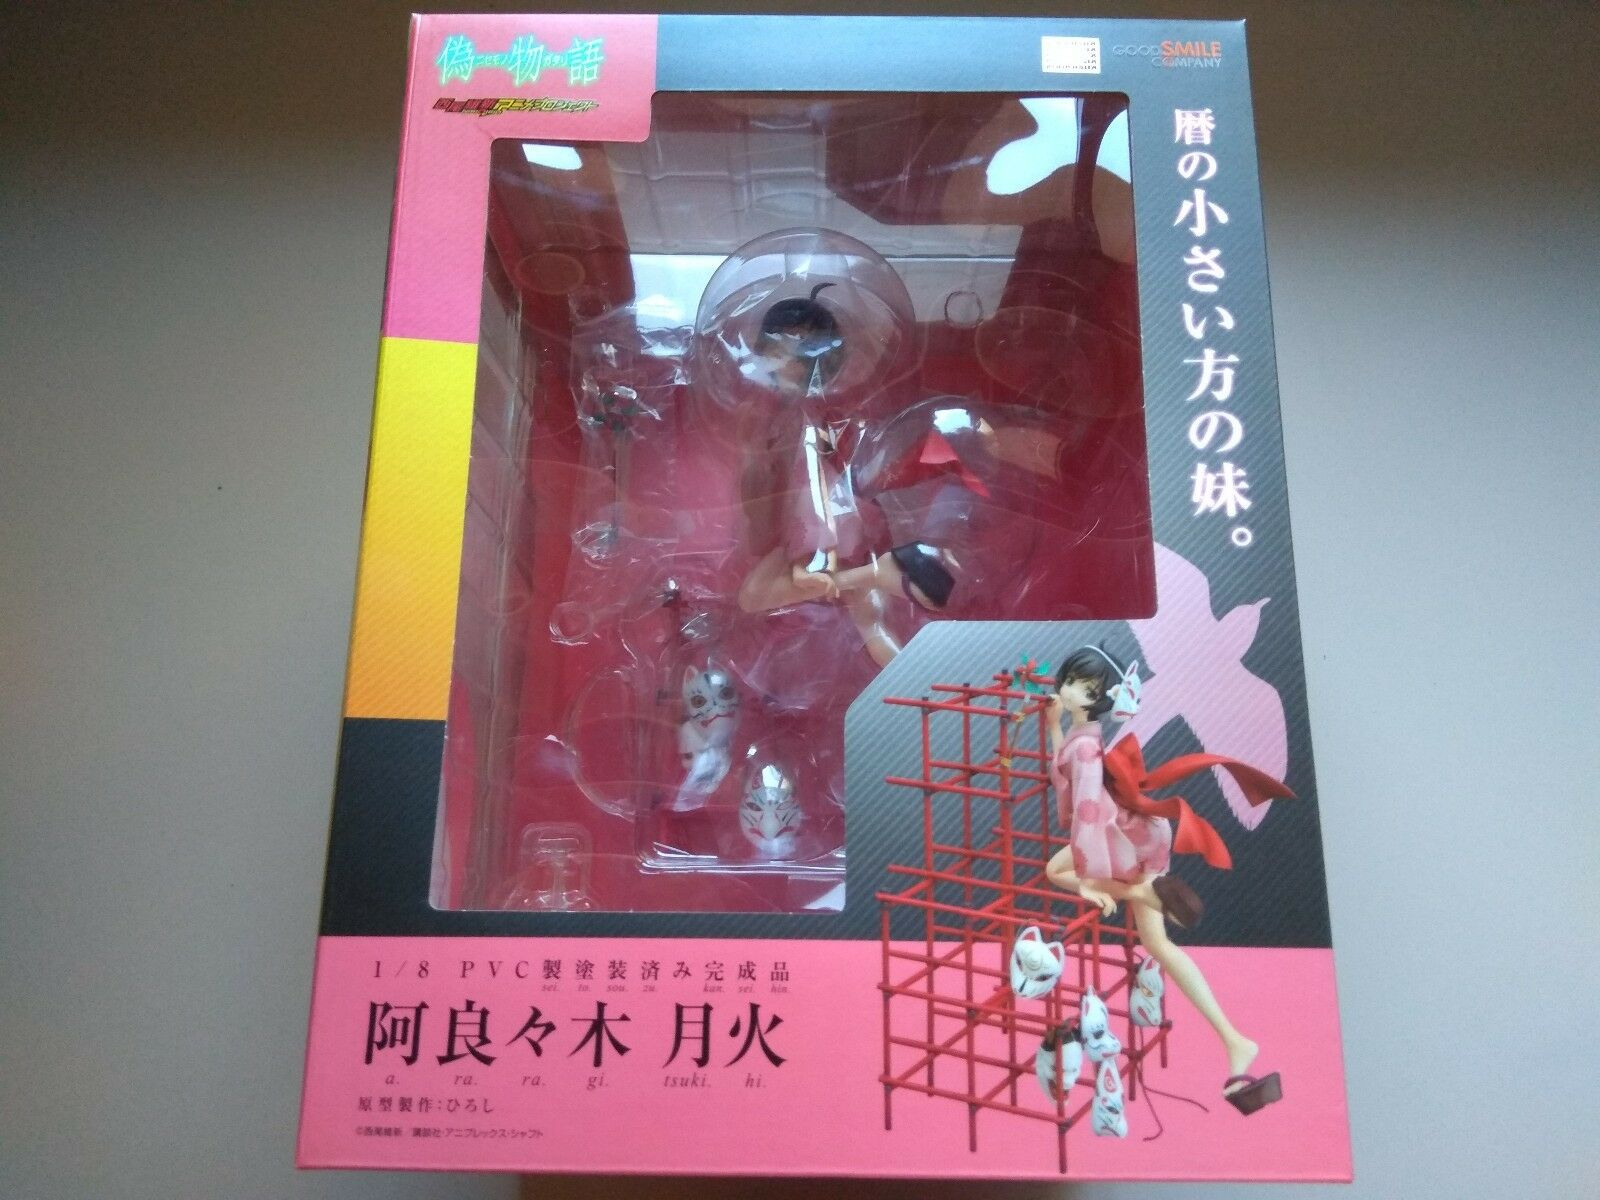 1 8 FIGURE NISEMONOGATARI - ARARAGI TSUKIHI - 1 8 (GOOD SMILE COMPANY)